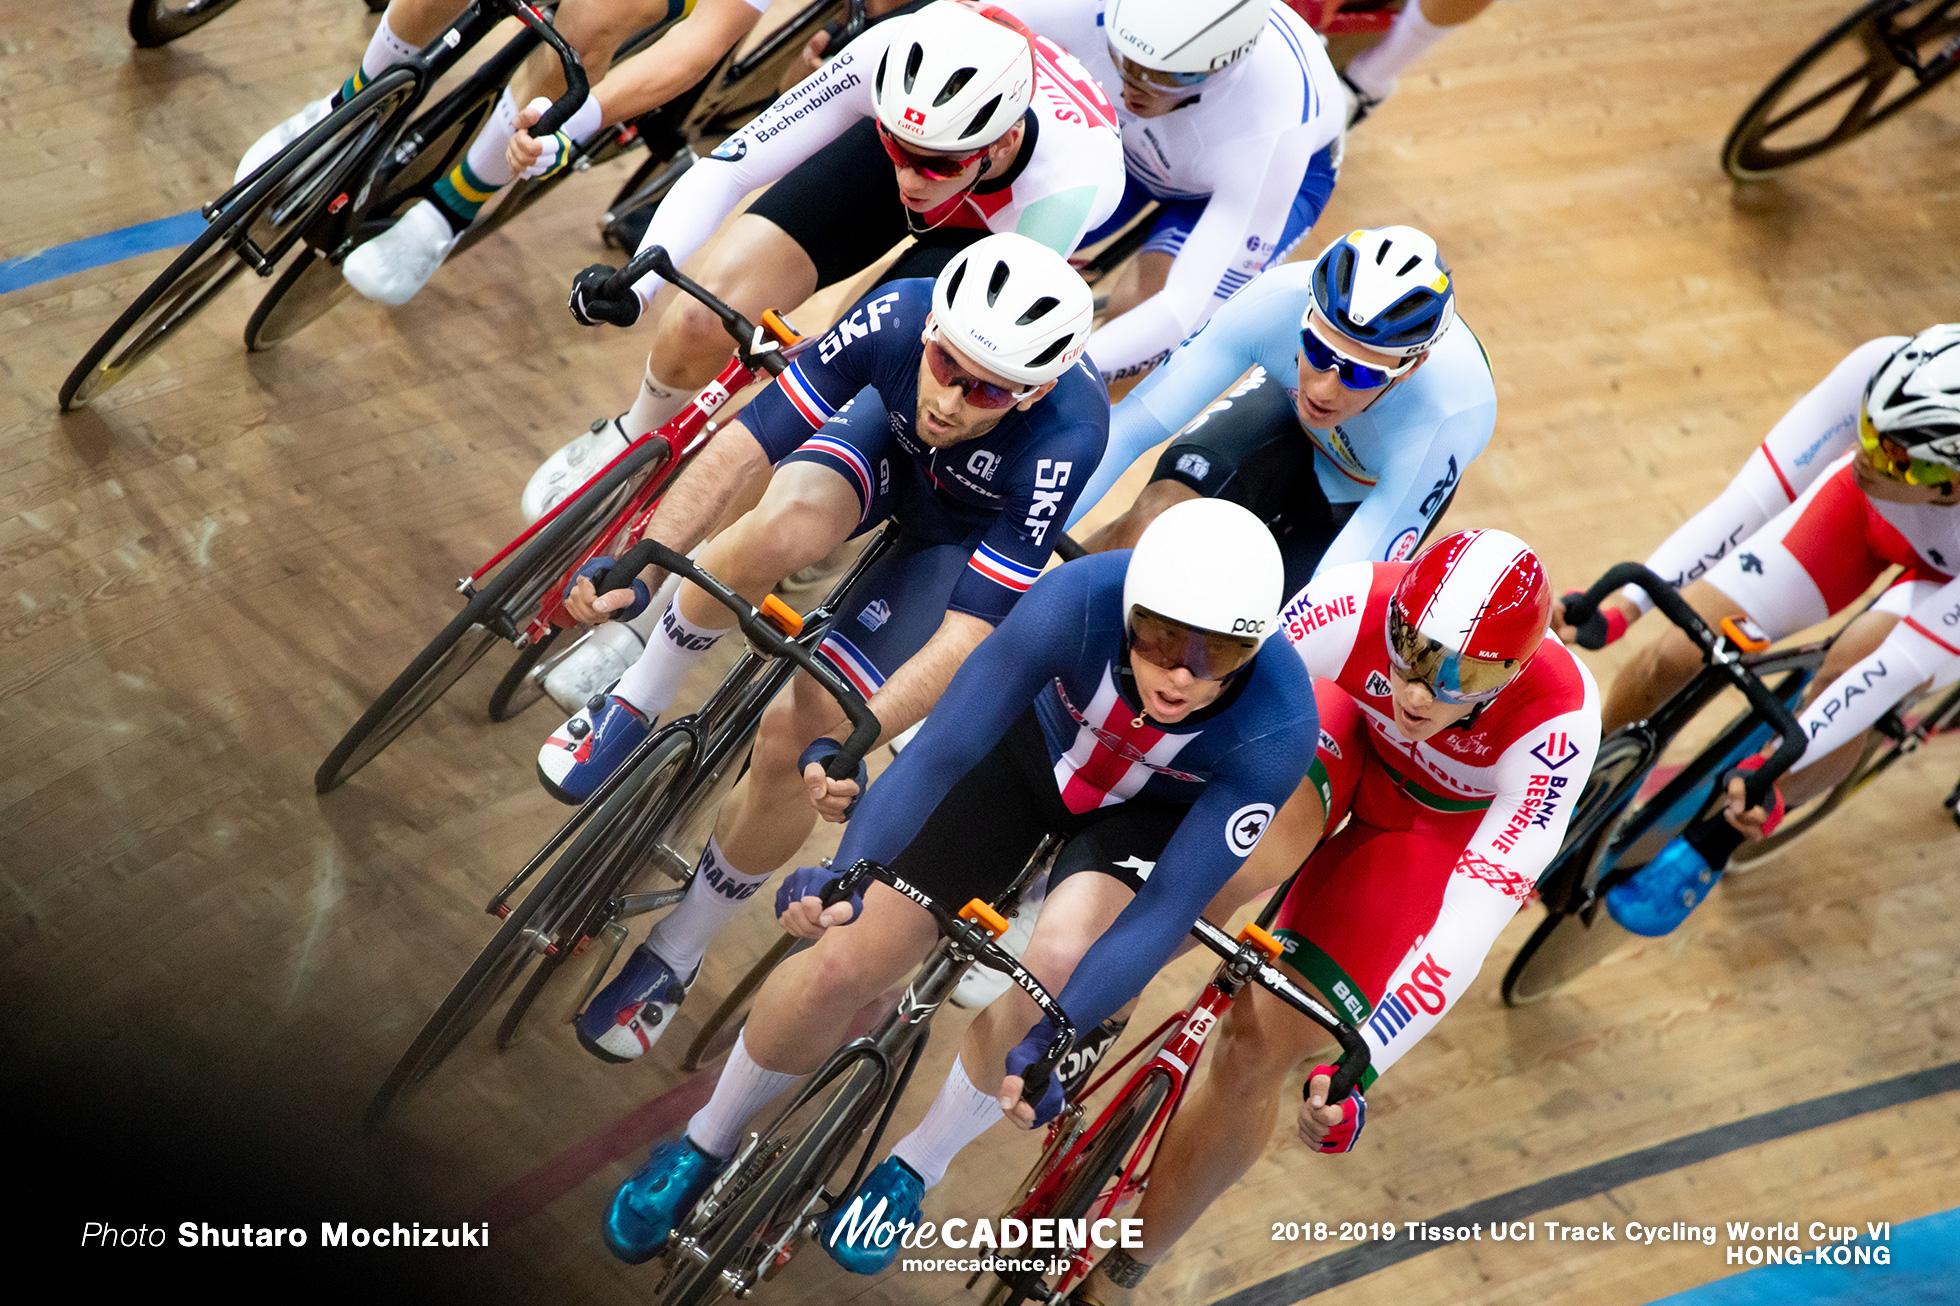 Ellimination / Men's Omnium / Track Cycling World Cup VI / Hong-Kong